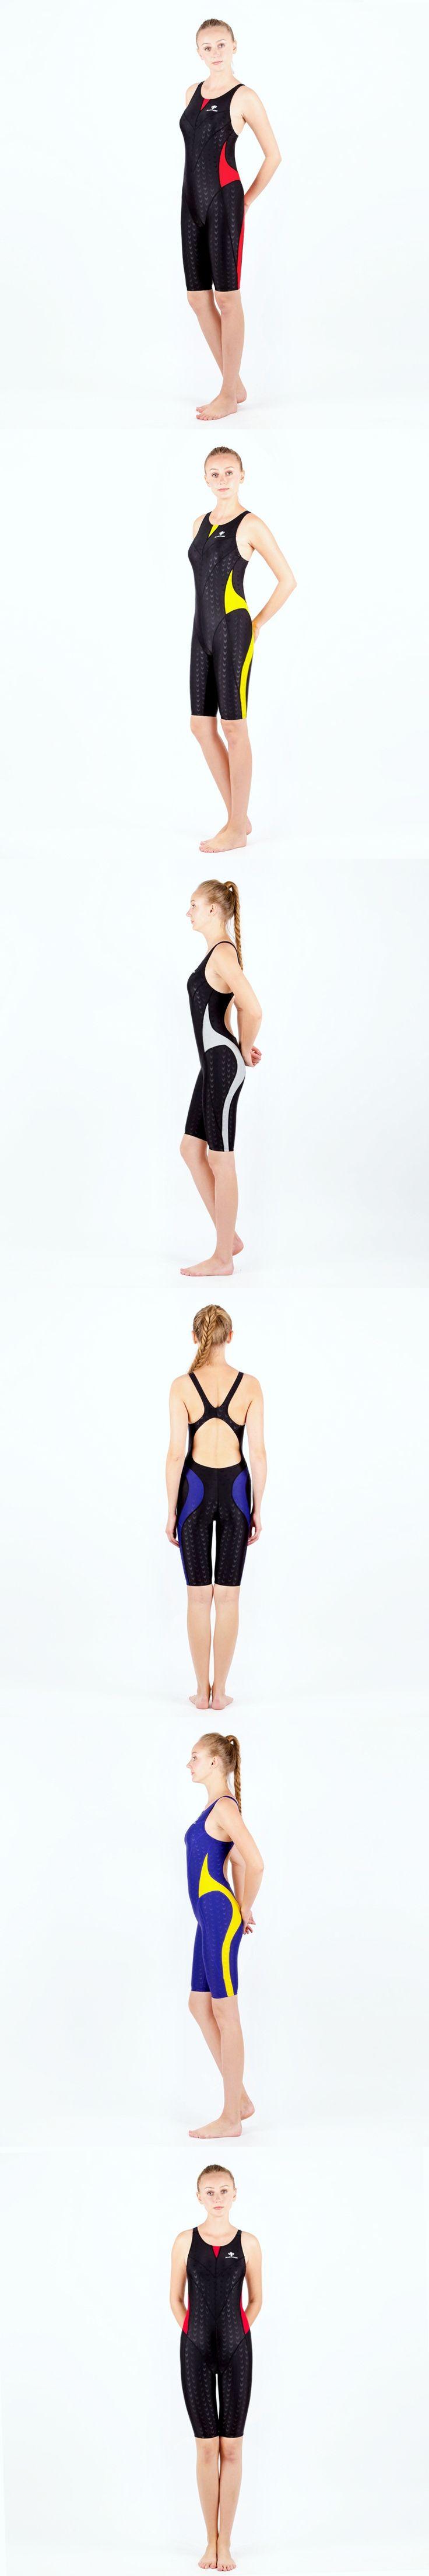 Professional One Piece Competition Racing Swimsuit Female Knee Bodysuit Quick Dry Long Boxer Shorts Plus Size  Bathing Suit